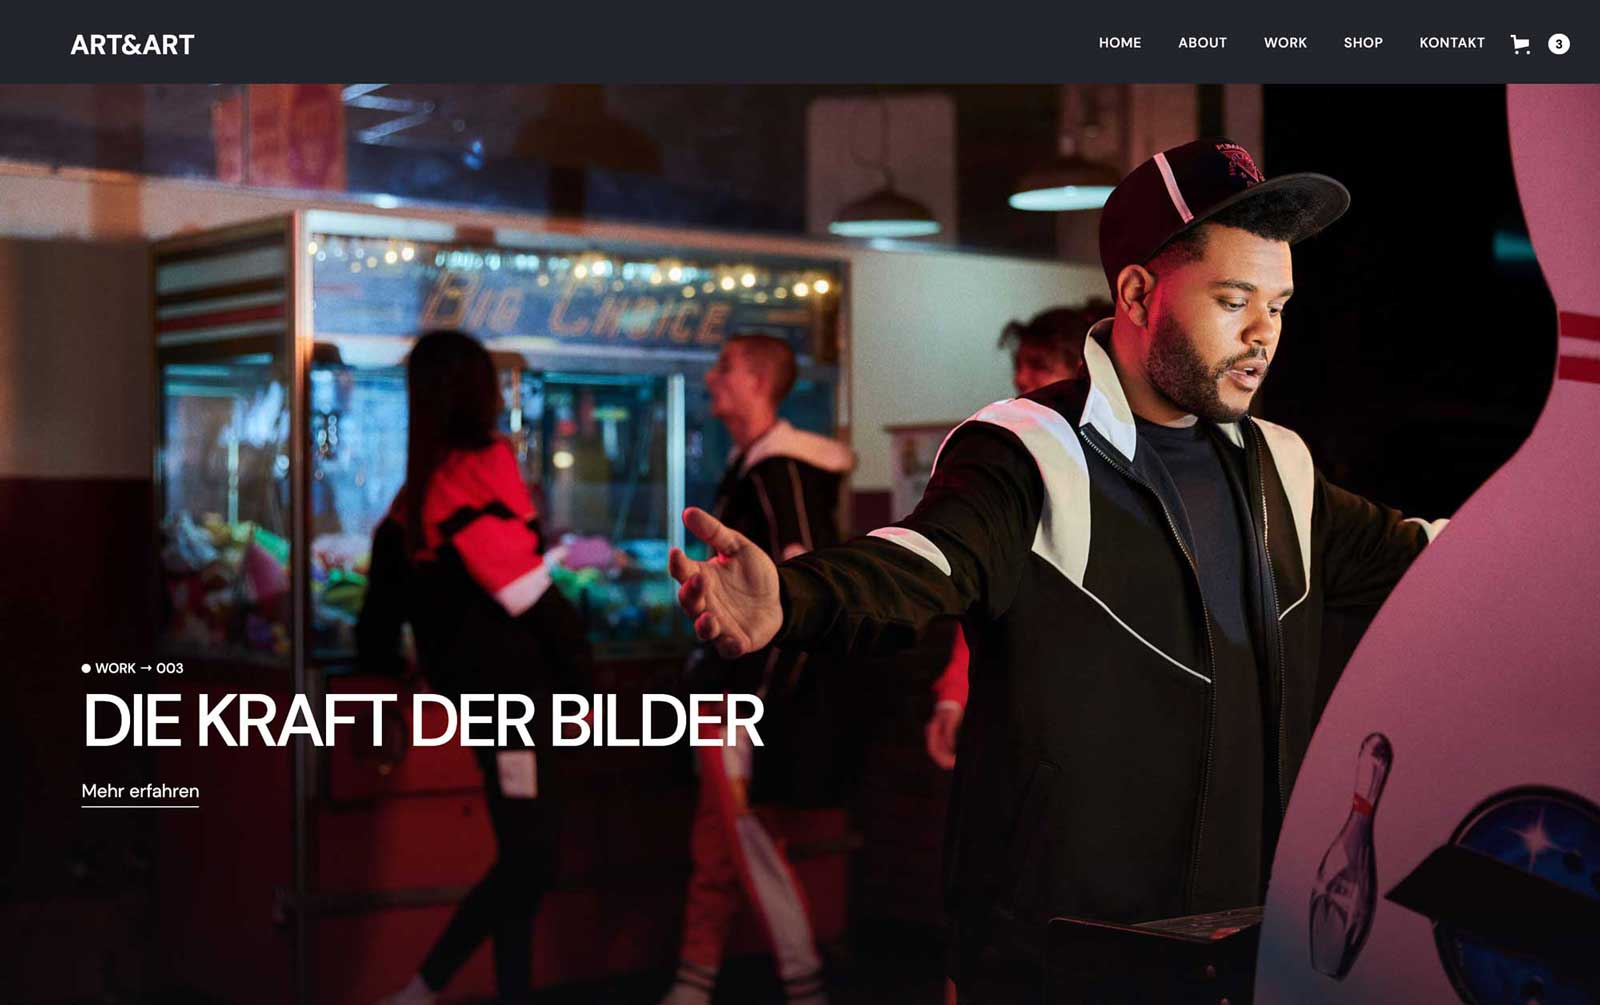 Website Startseite Browser Onlineshop Navigation Home About Work Shop Kontakt